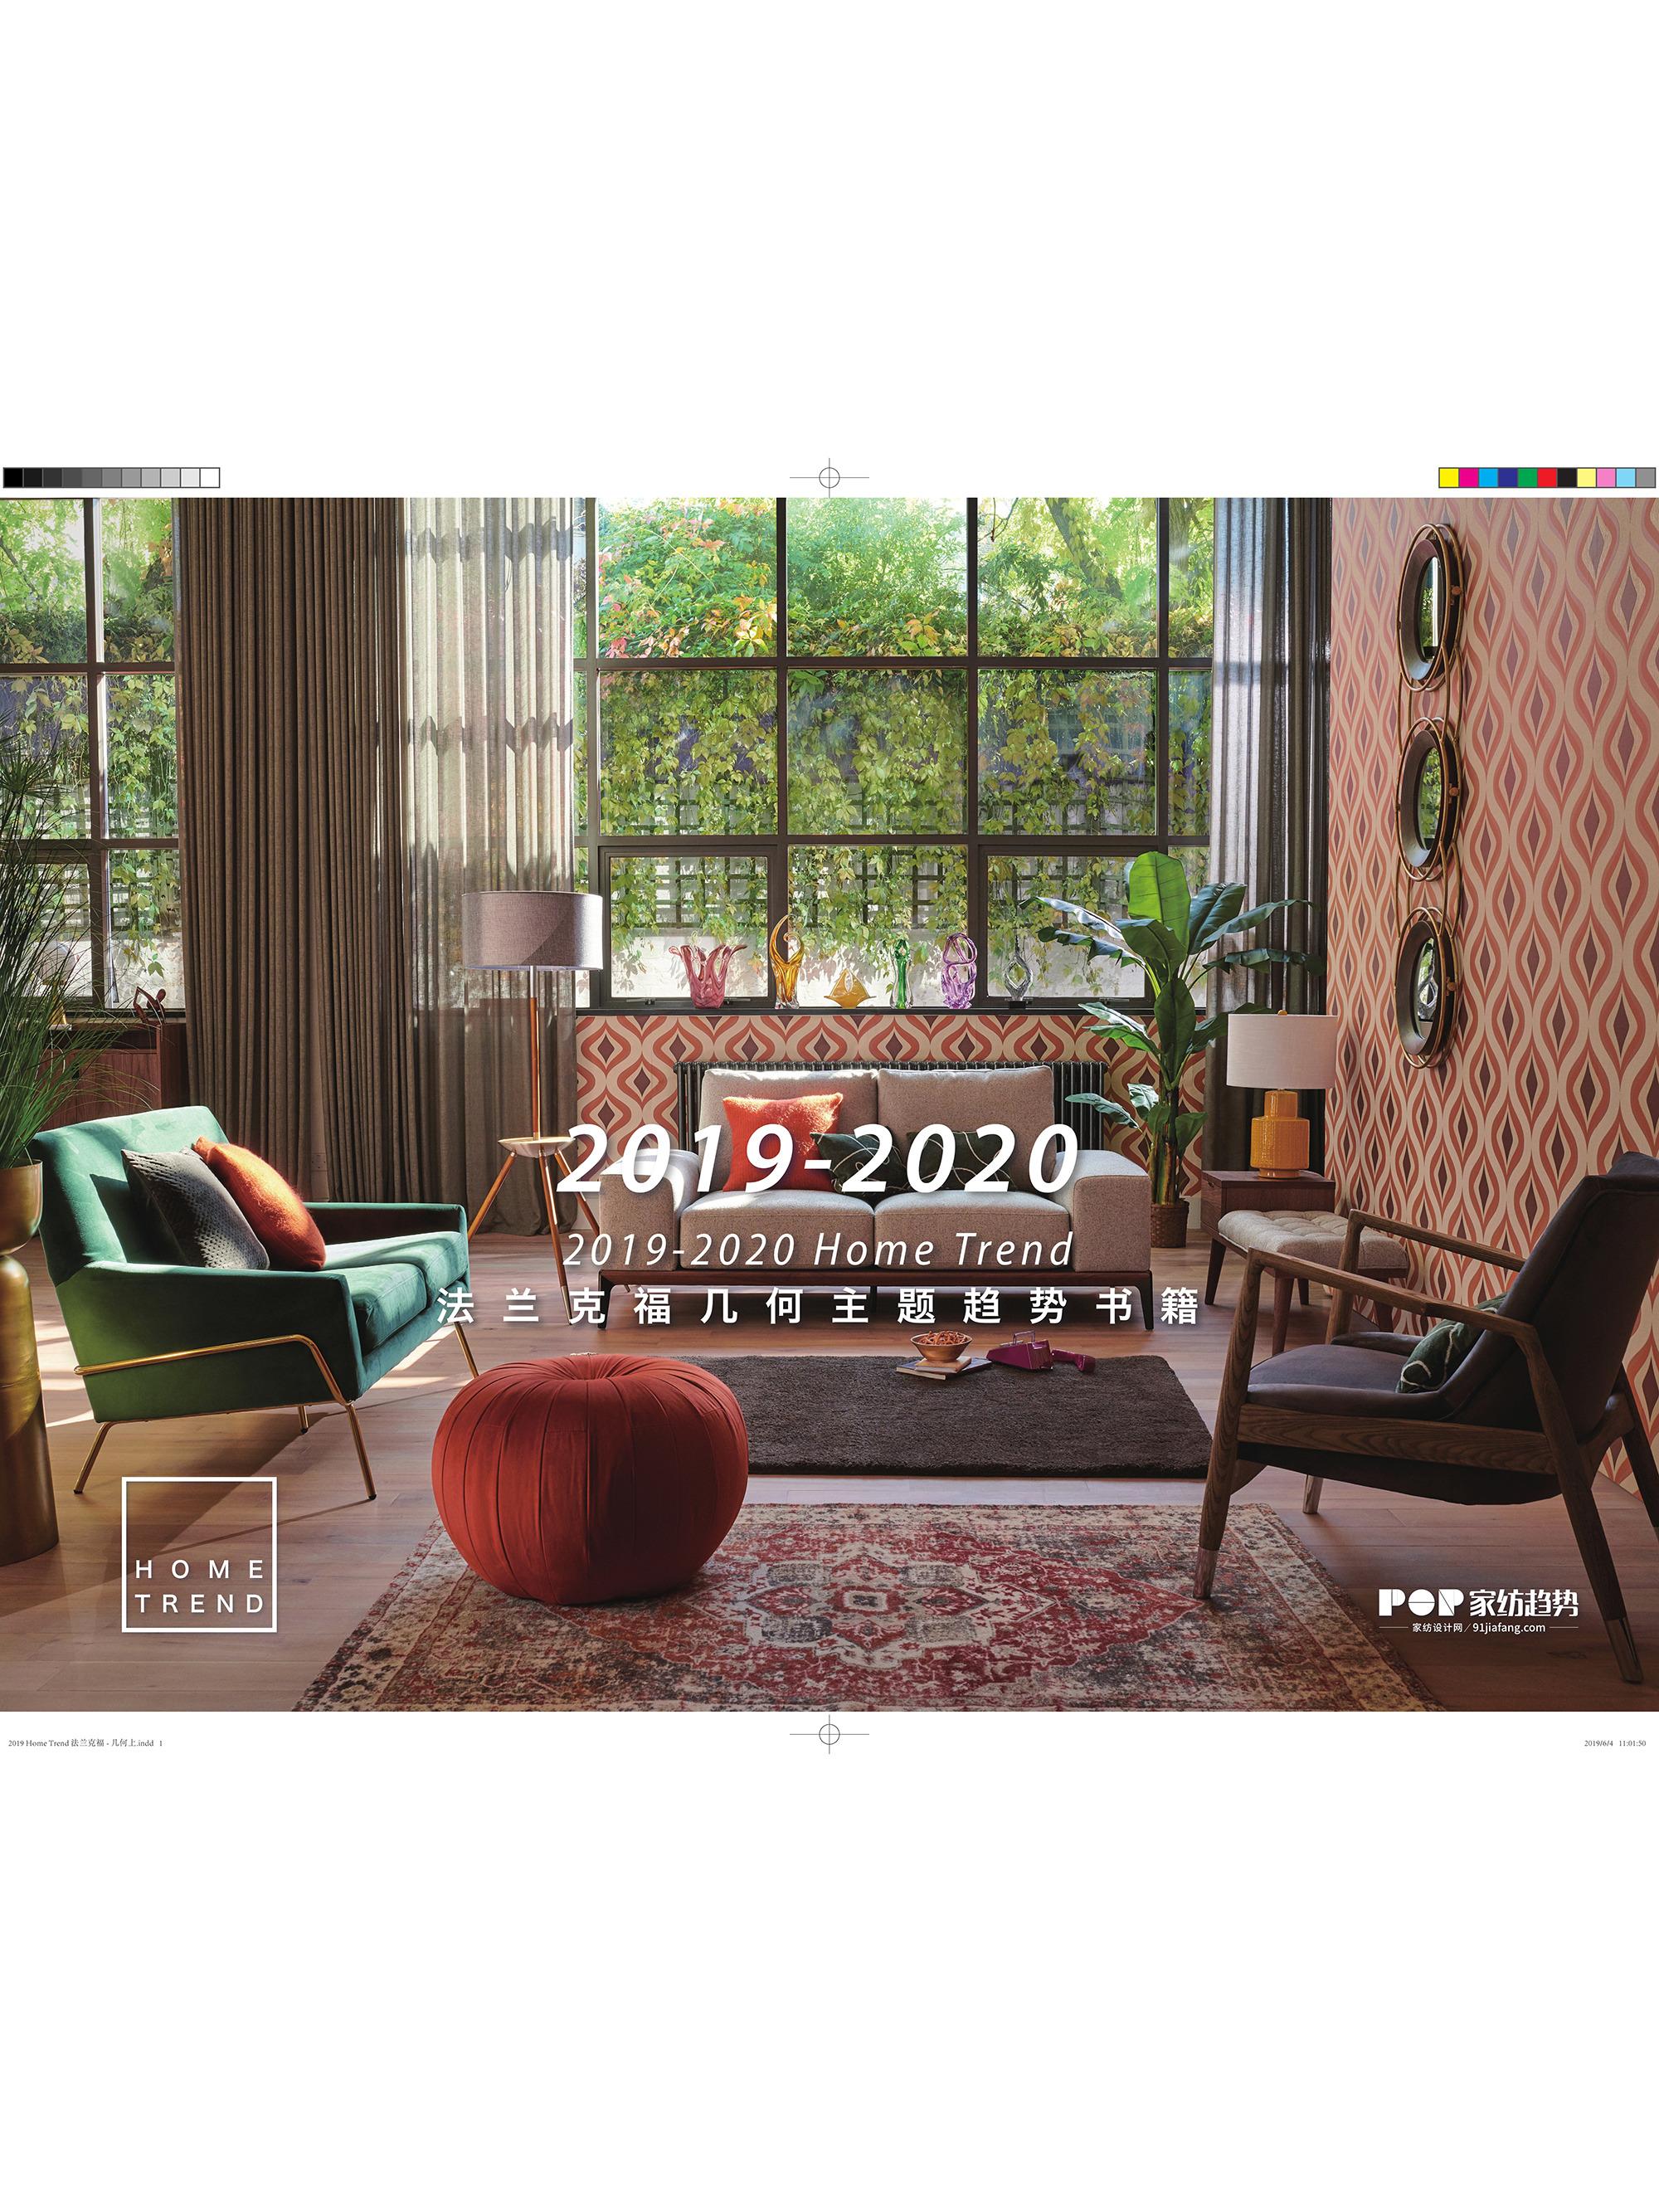 《HOME TREND》2019-2020法兰克福几何主题趋势书籍(一)